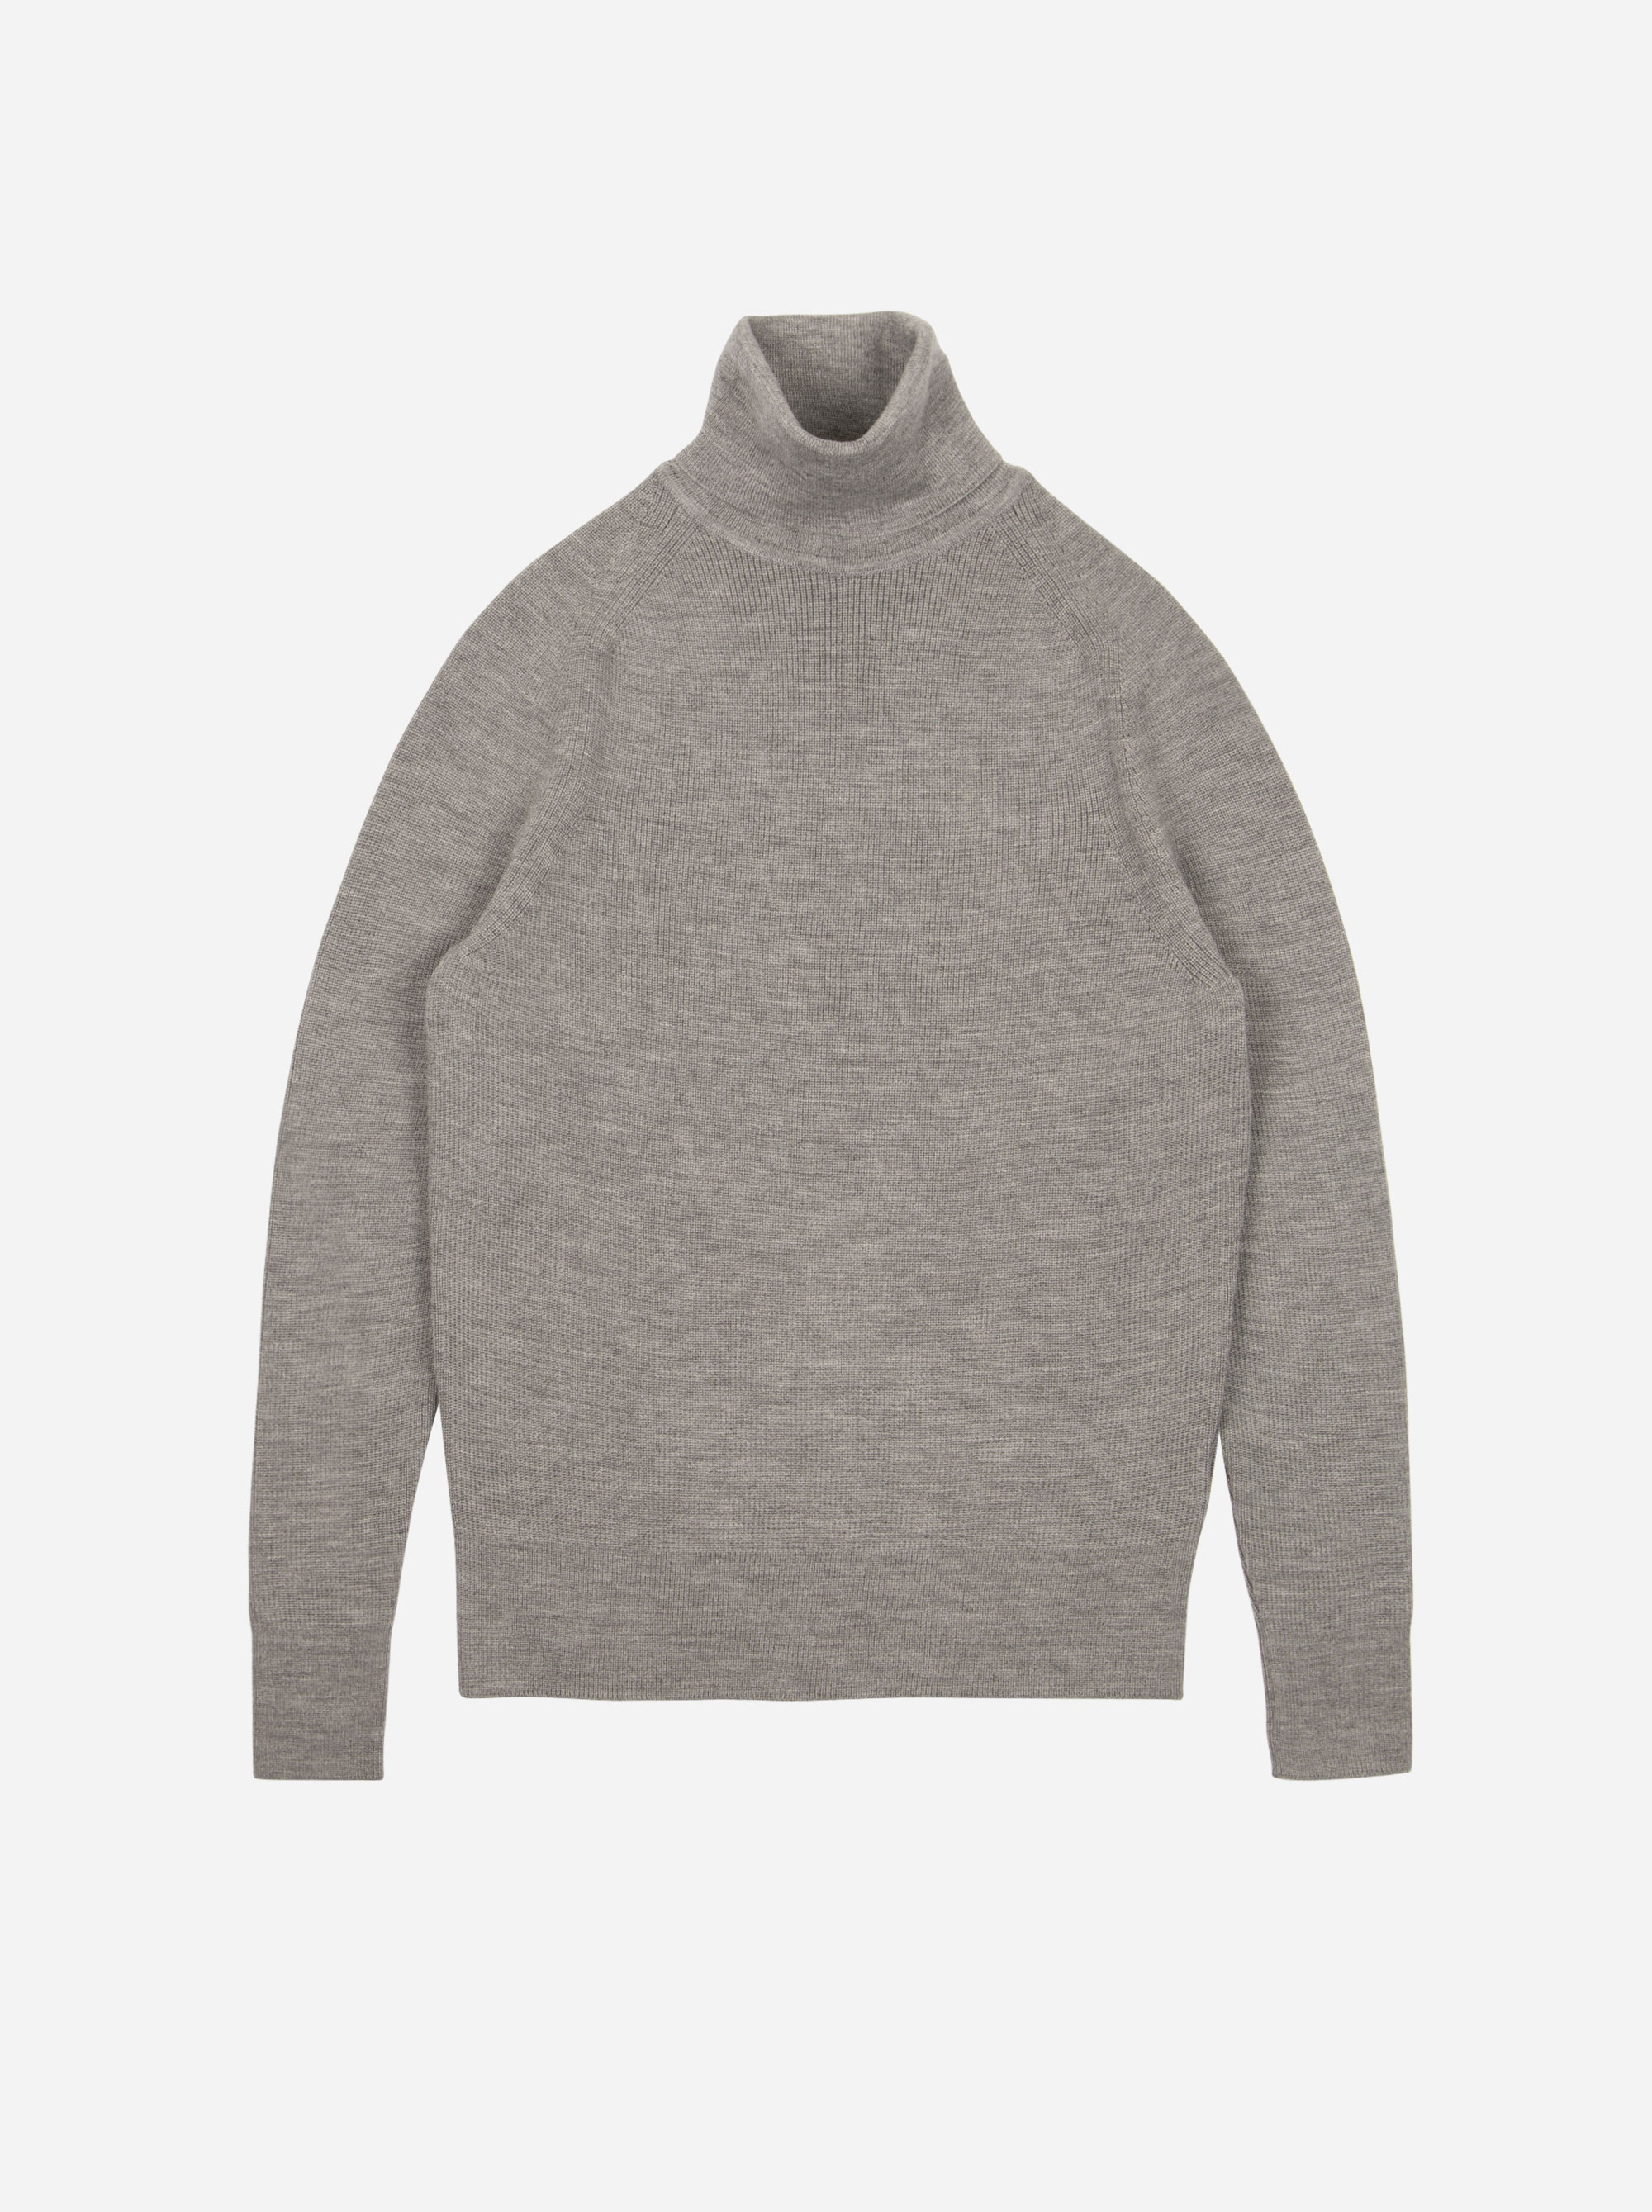 Teym - Turtleneck - The Merino Sweater - Men - Grey - 6